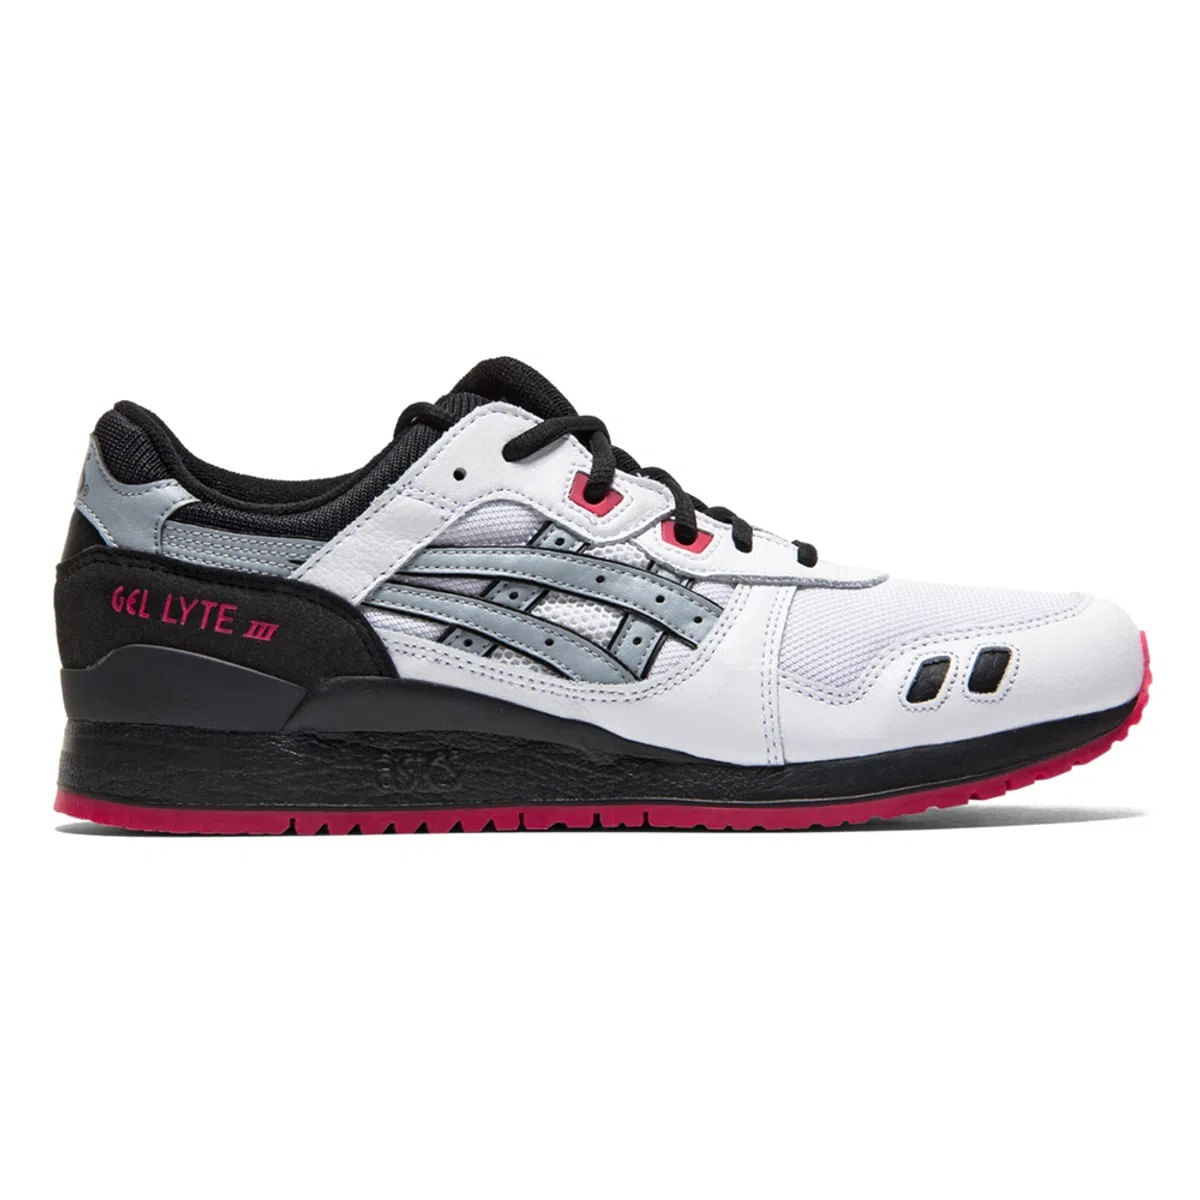 Tenis-ASICS-Tiger-GEL-Lyte-III---Unissex---Preto-e-Branco